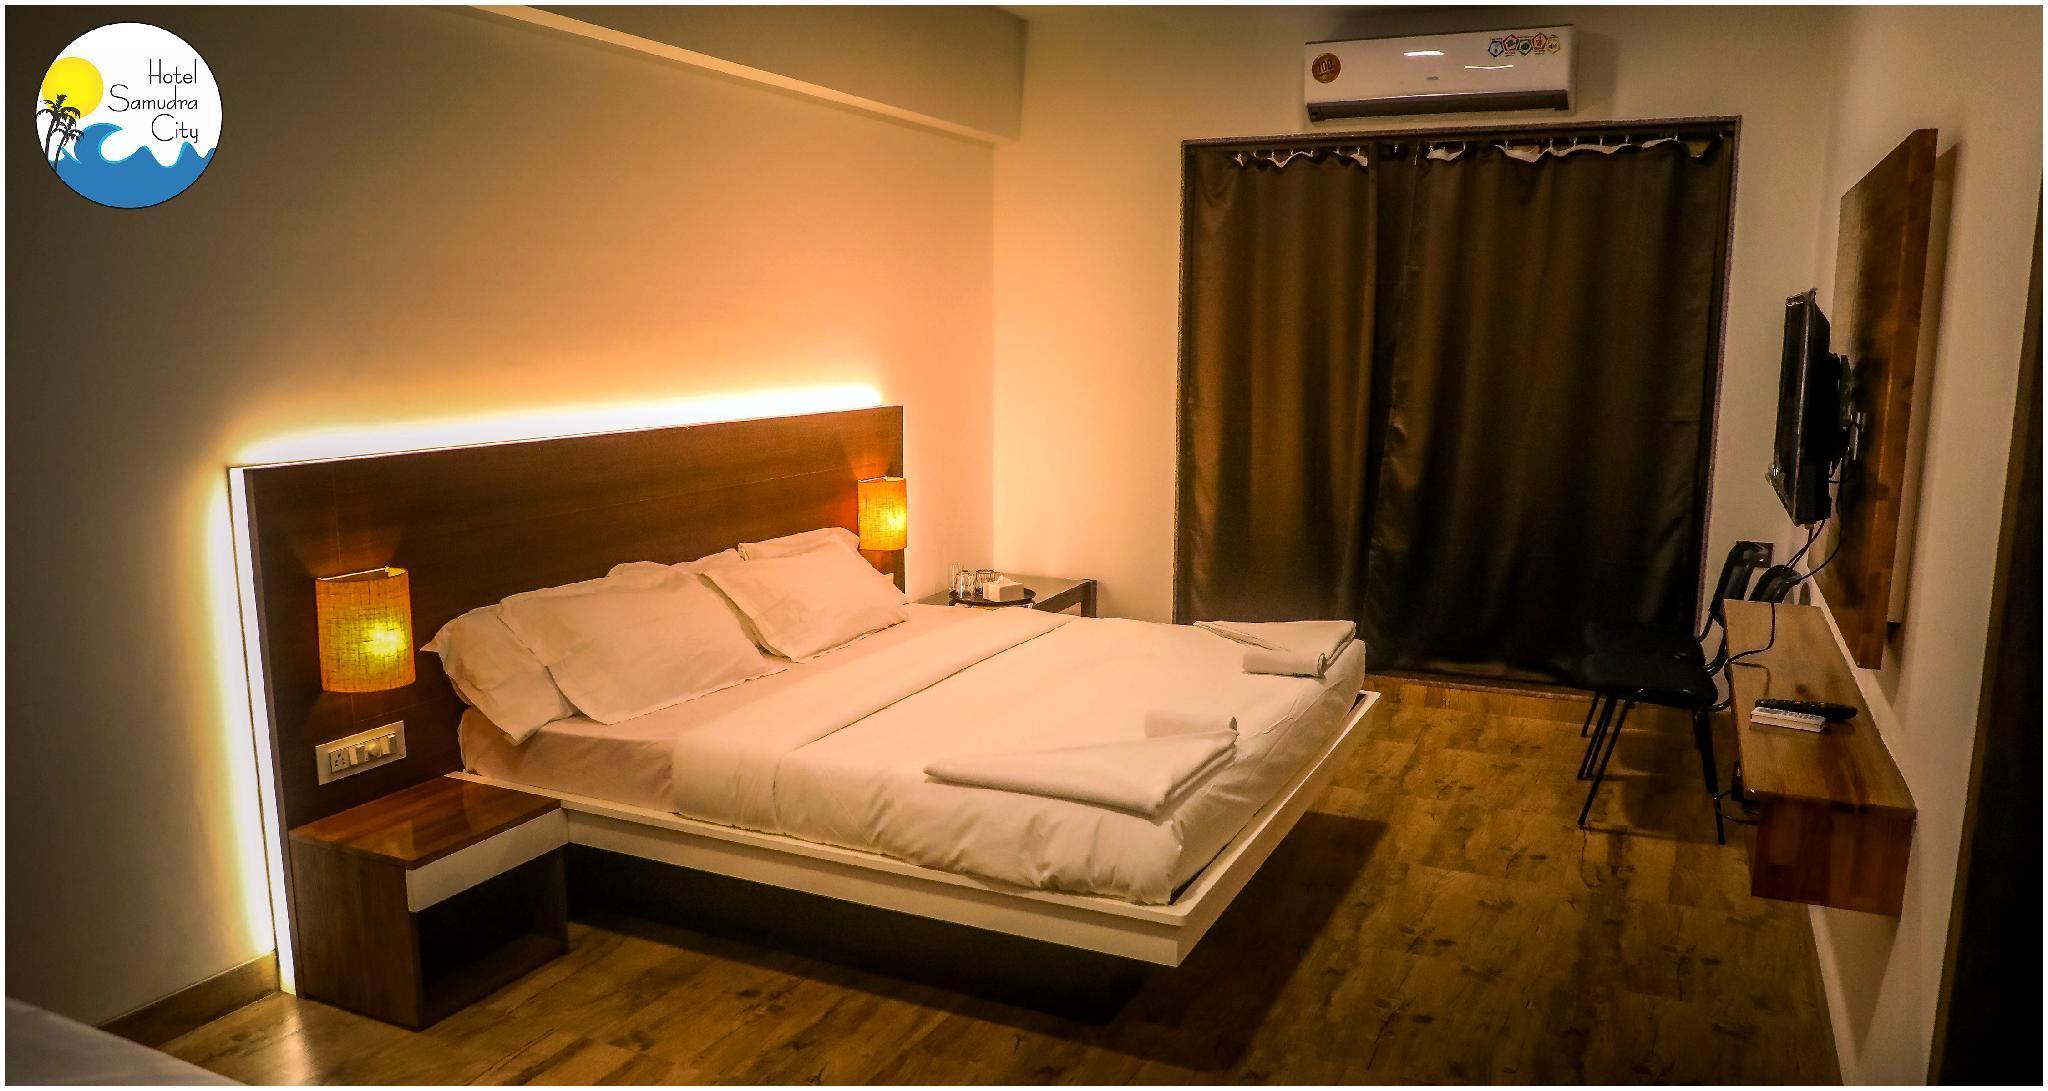 Hotel Samudra City, Raigarh